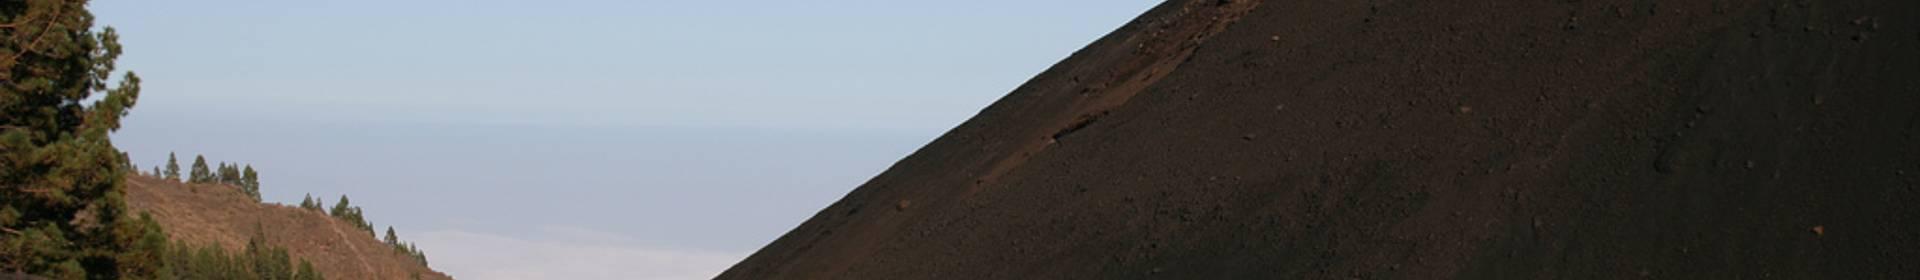 Volcan de la Corona